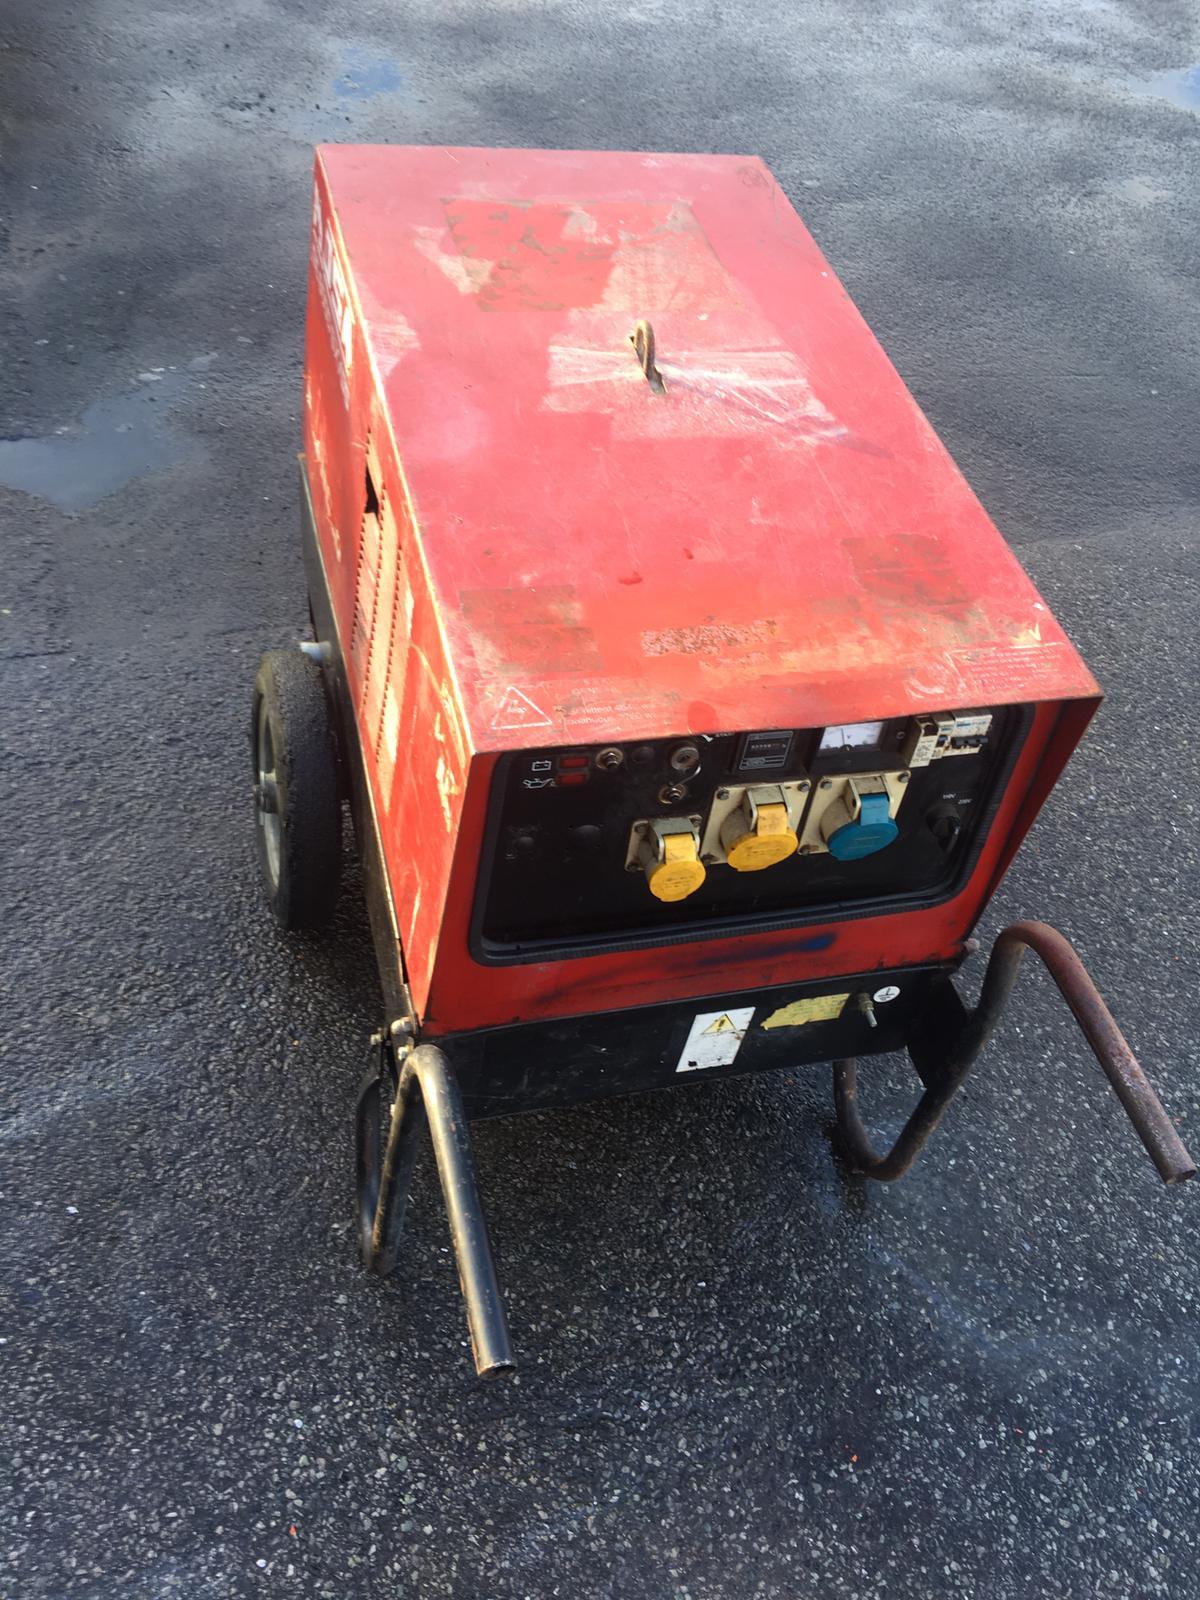 Lot 86 - MOSA GE 6000 SX/GS SUPER SILENCED WHEELED GENERATOR, 6 KVA, 3000 RPM, 50 Hz, RUNS AND WORKS *NO VAT*